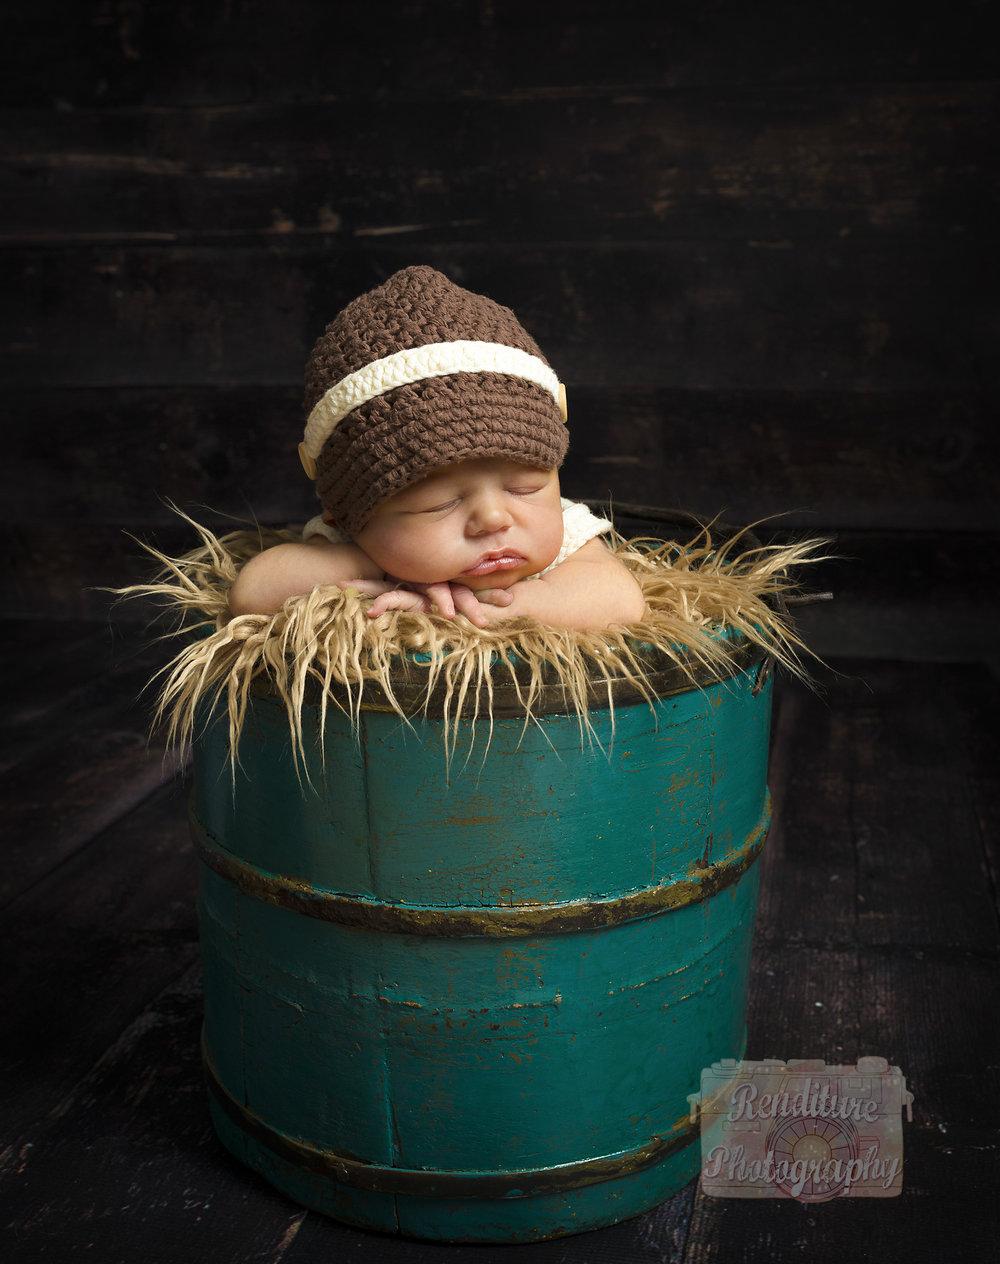 Saskatoon-Newborn-Family-Renditure-Baby-Photography-Photographer-Maternity-Pregnancy-Saskatchewan-342 FBR.jpg